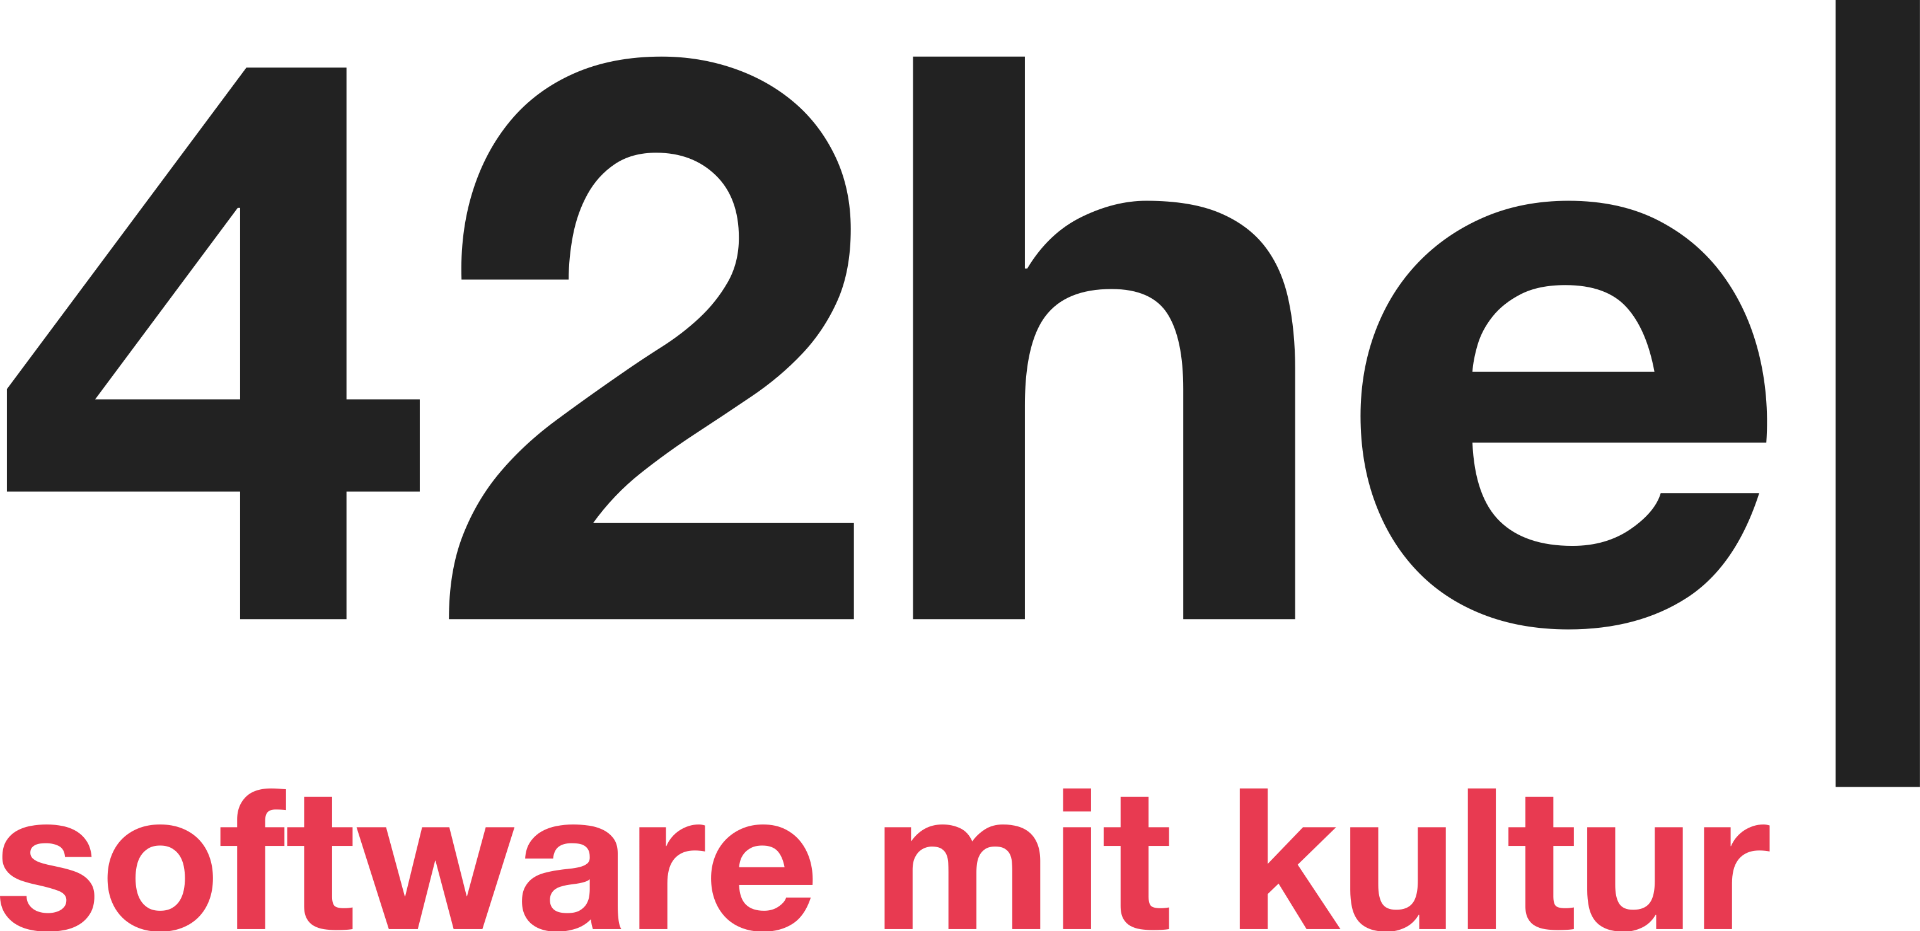 logo 42he RGB